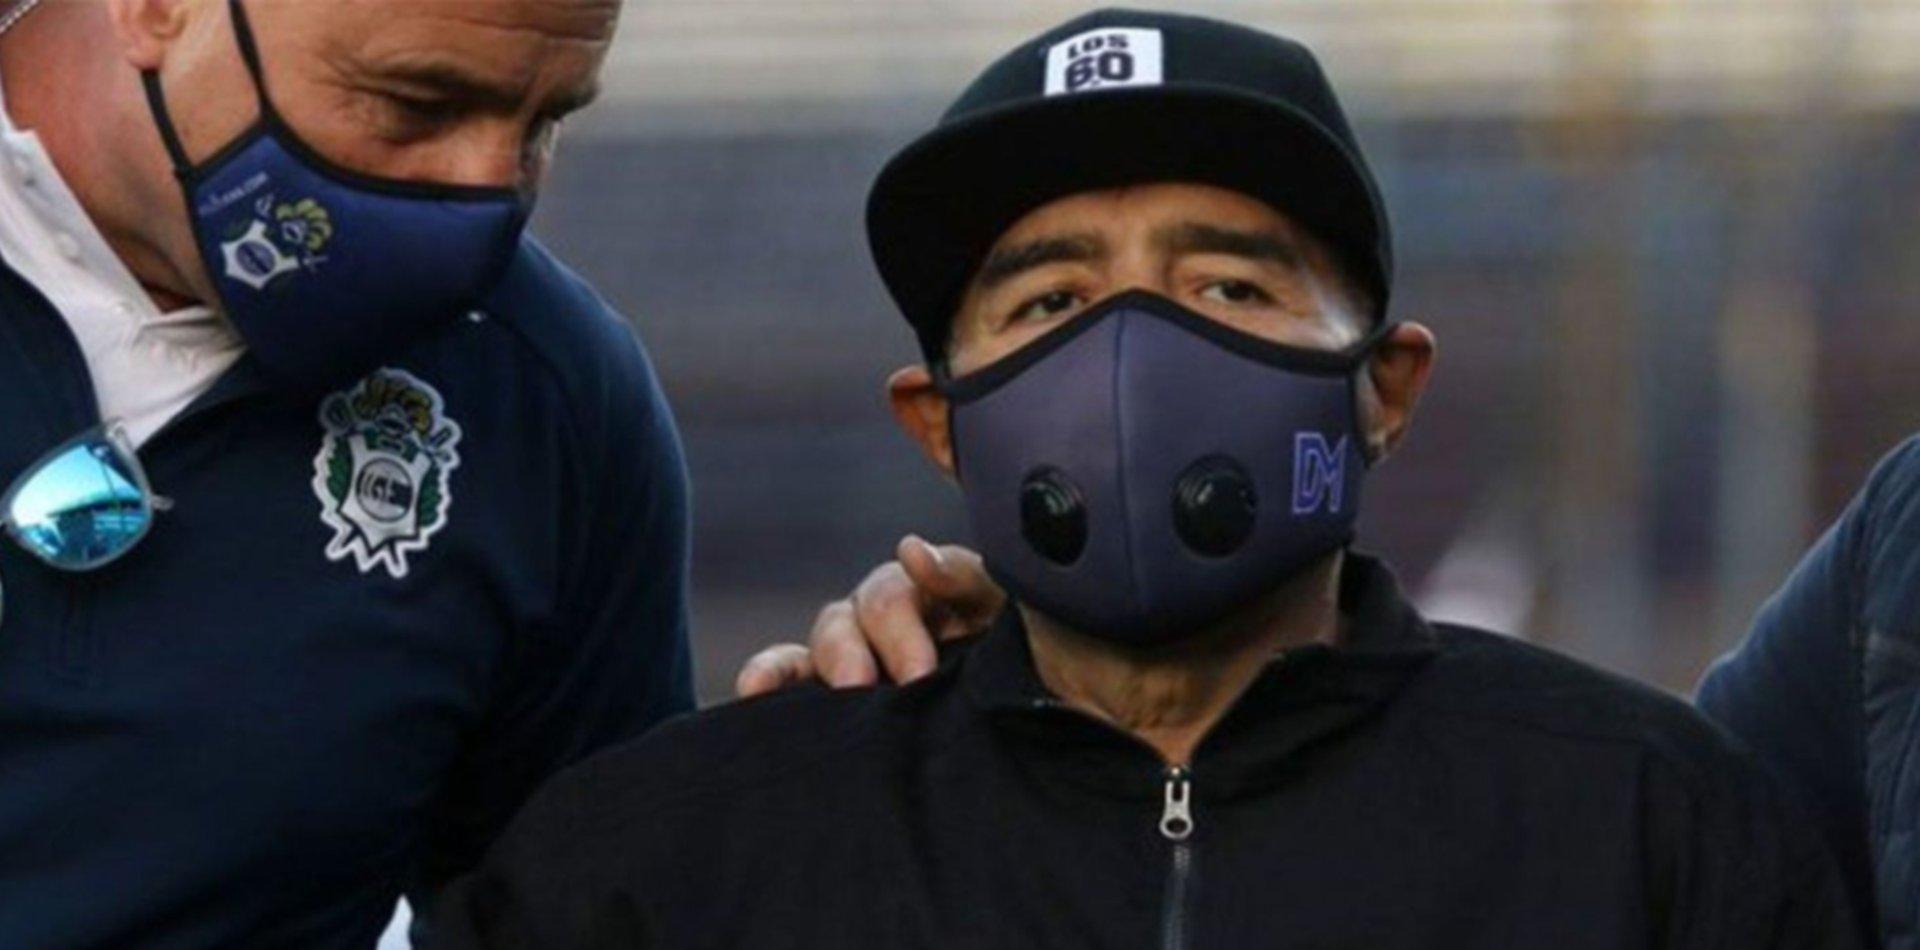 ¿Cuáles eran los dos pensamientos que atormentaban a Maradona días antes de morir?